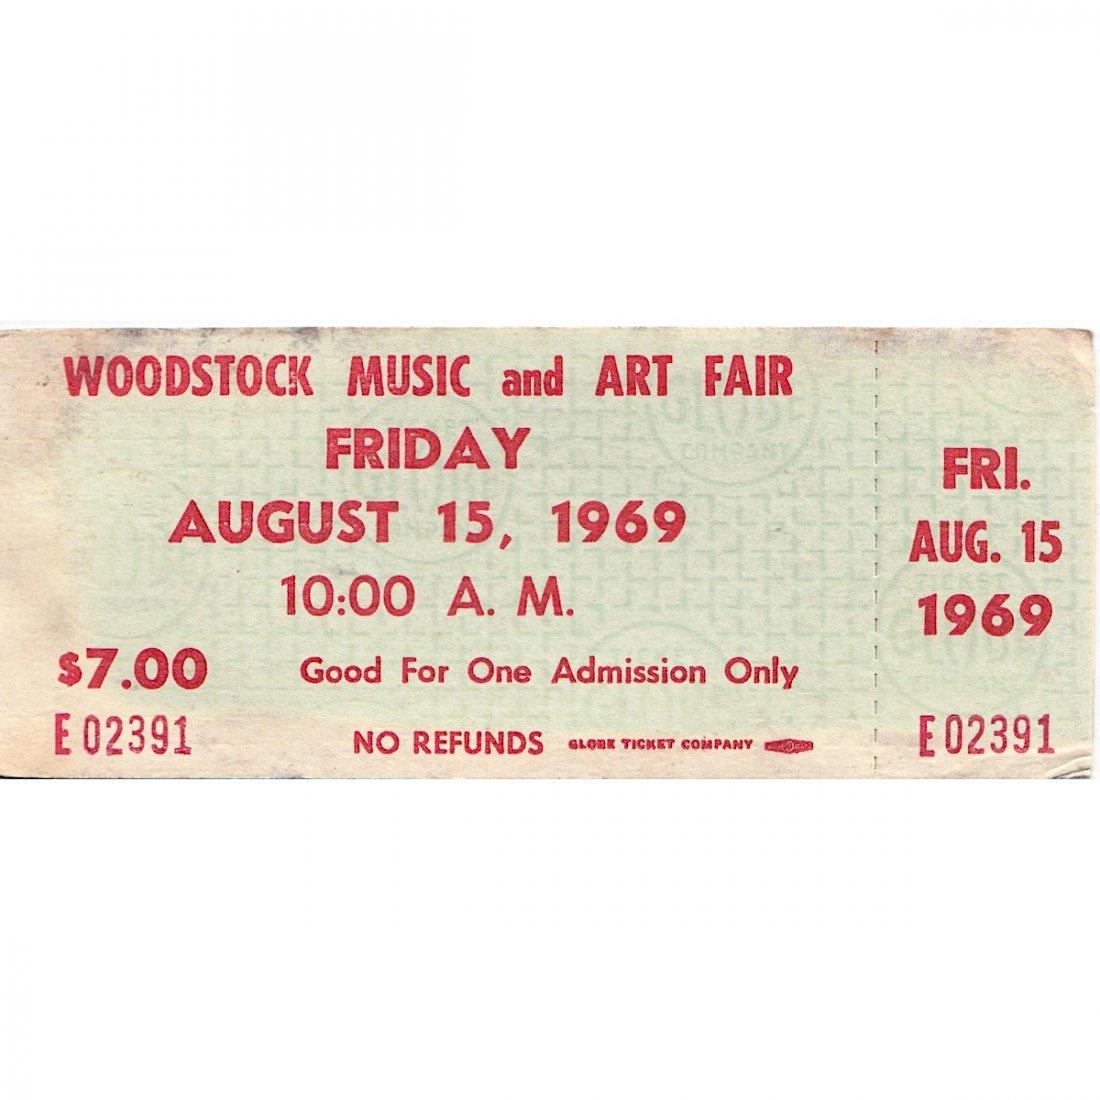 Woodstock - 1969 Advanced $7.00 Vintage Concert Ticket